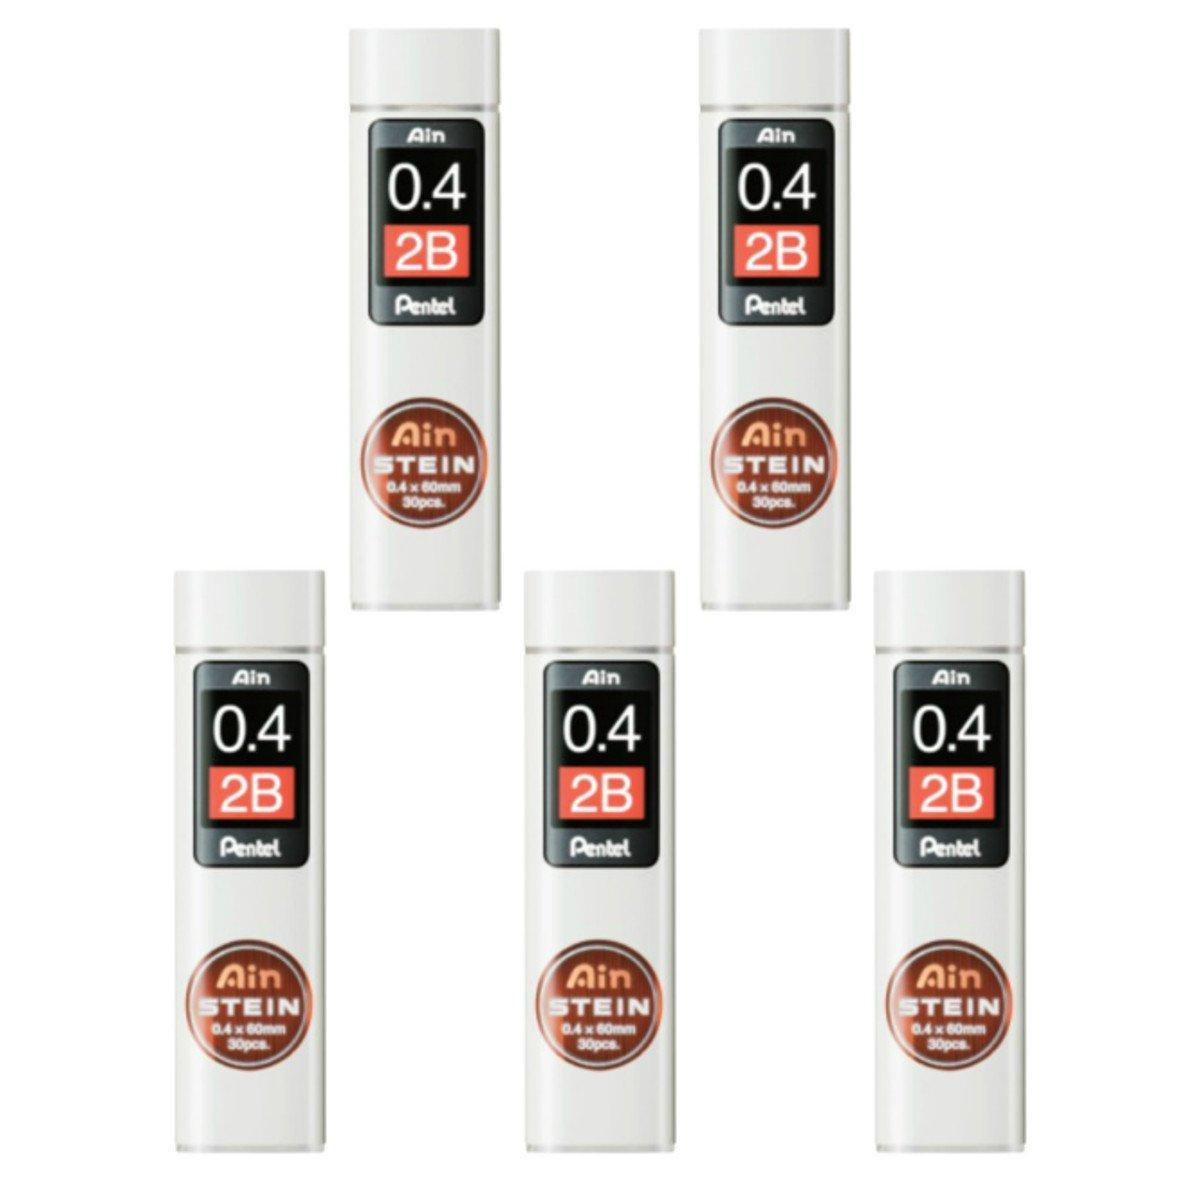 Pentel Ain Mechanical Pencil Leads 0.4mm 2B, 5 Pack/total 150 Leads Value Set